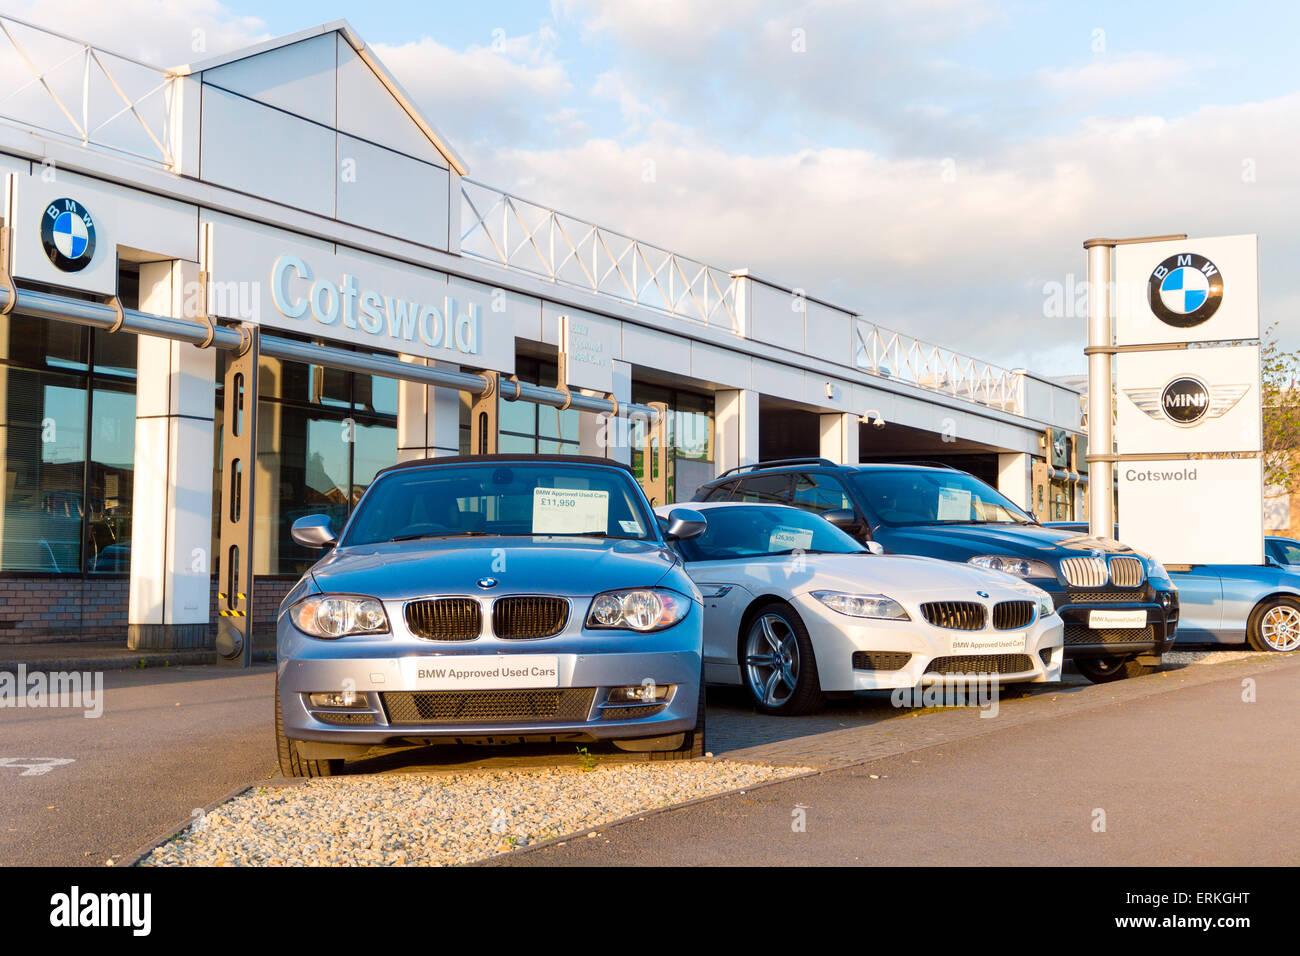 Cotswold BMW car dealership in Cheltenham, UK. - Stock Image